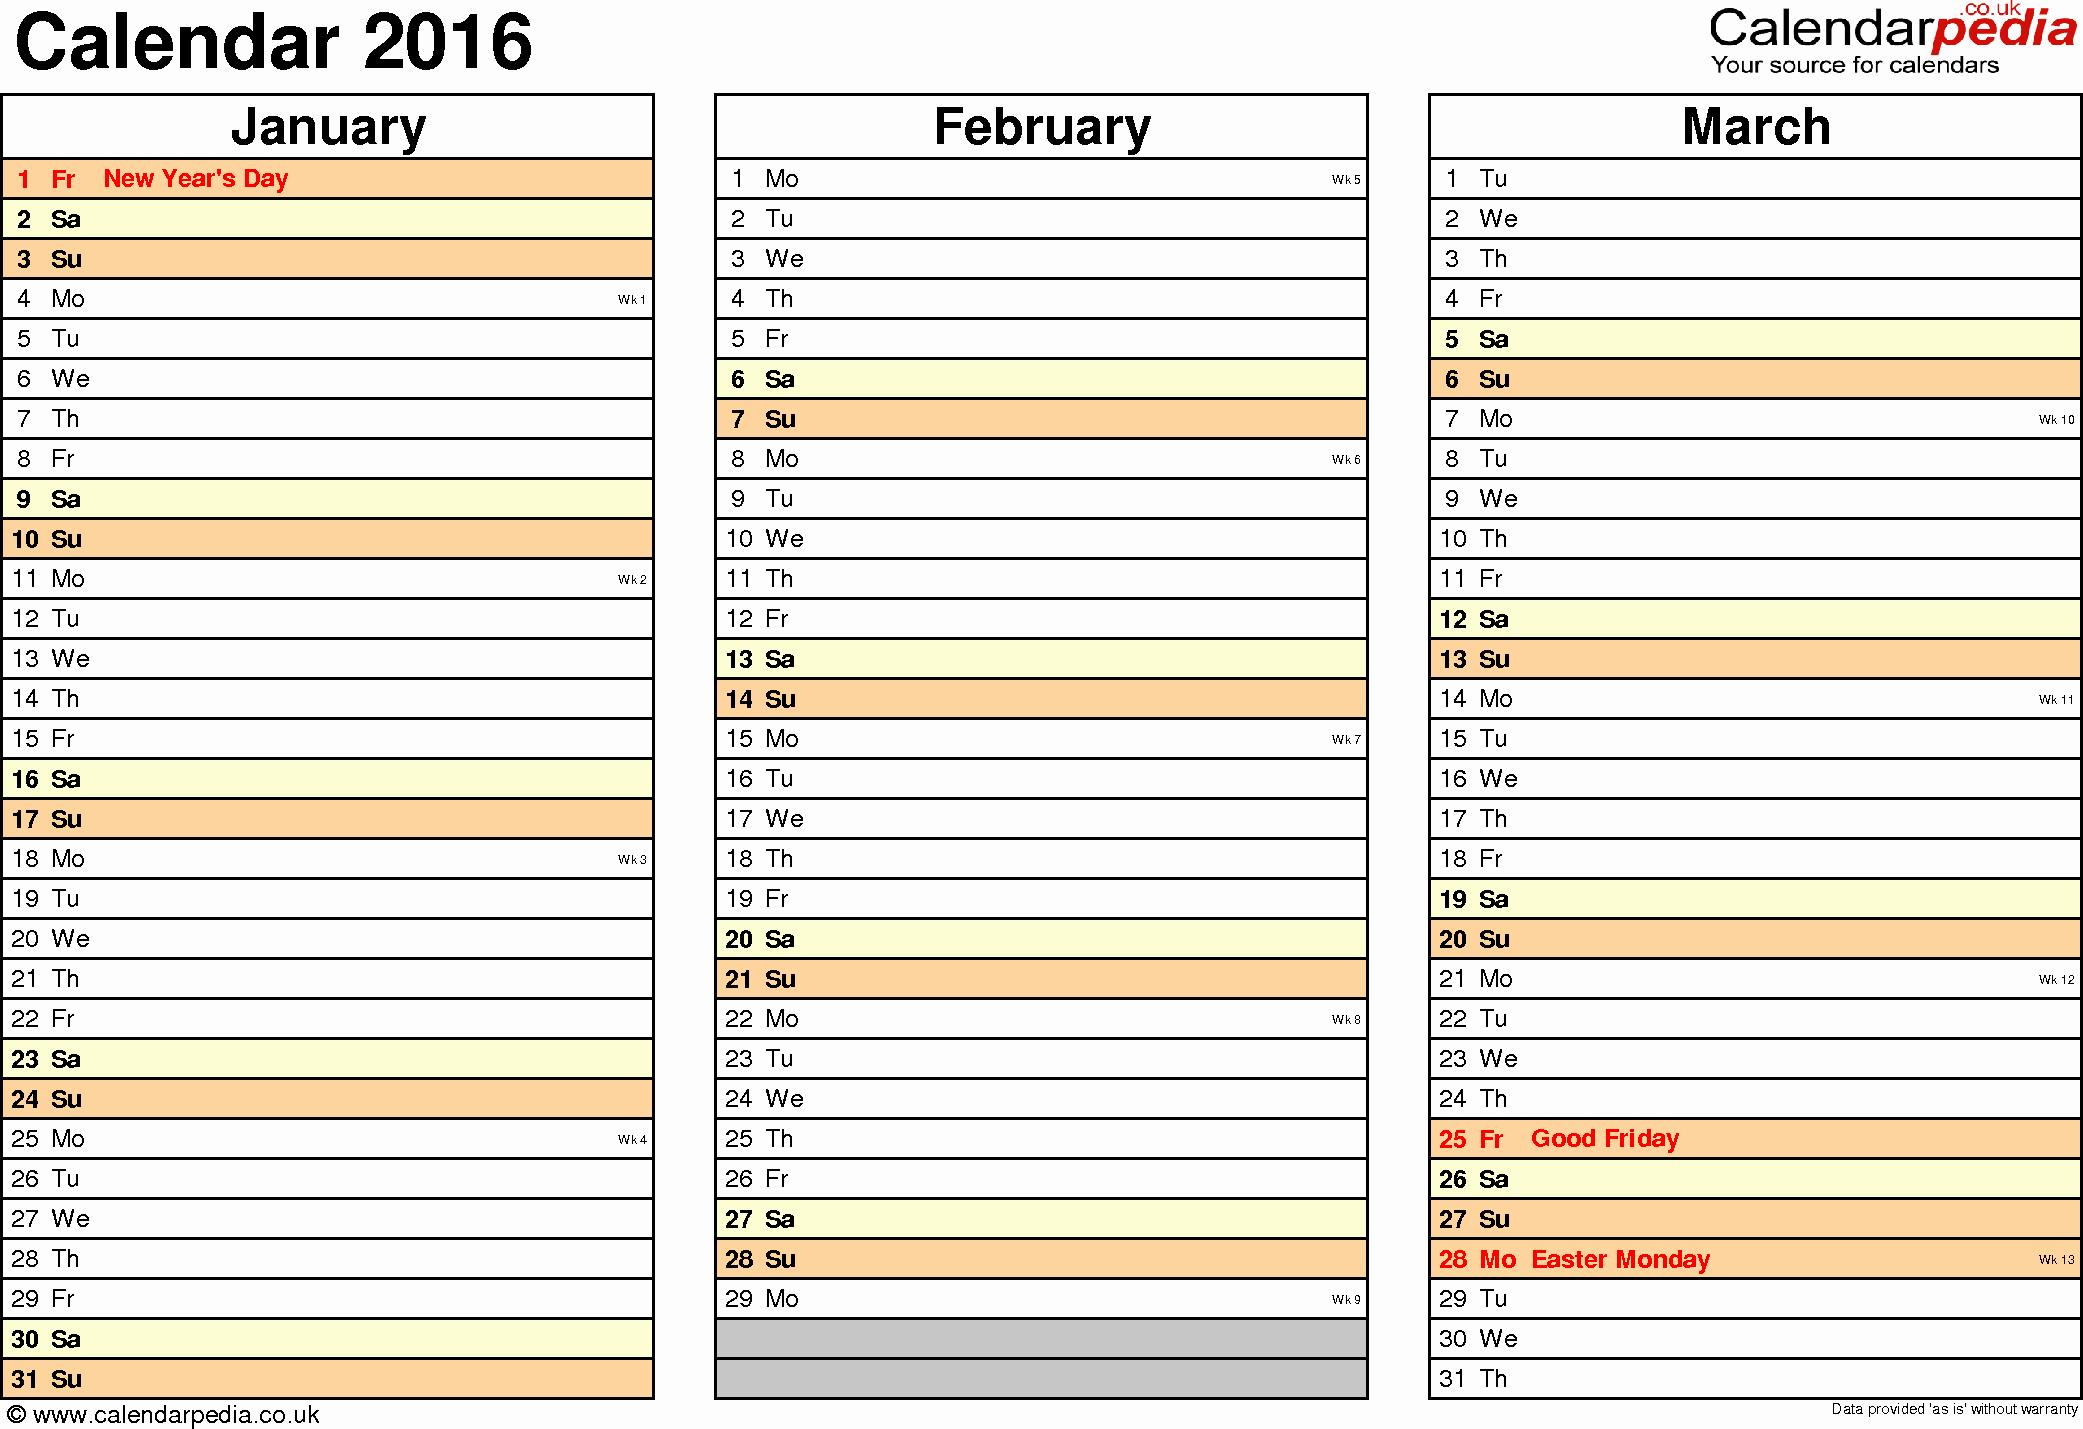 2016 Calendar Excel with Holidays Beautiful Excel Calendar 2016 Uk 16 Printable Templates Xlsx Free